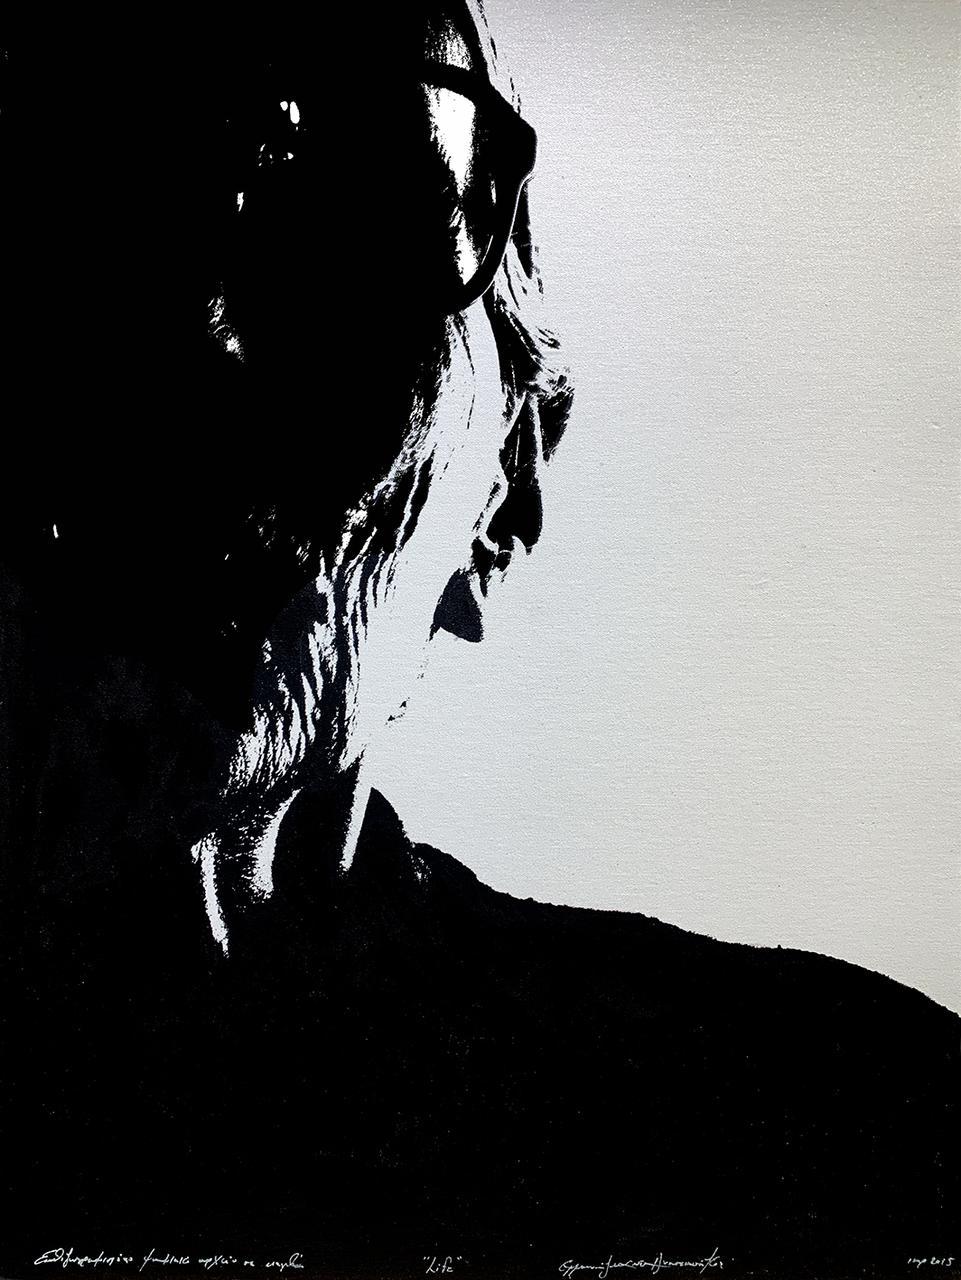 Life, 2015, επιζωγραφισμένο ψηφιακό έργο (ακρυλικό σε καμβά), 79x58.5 εκ.